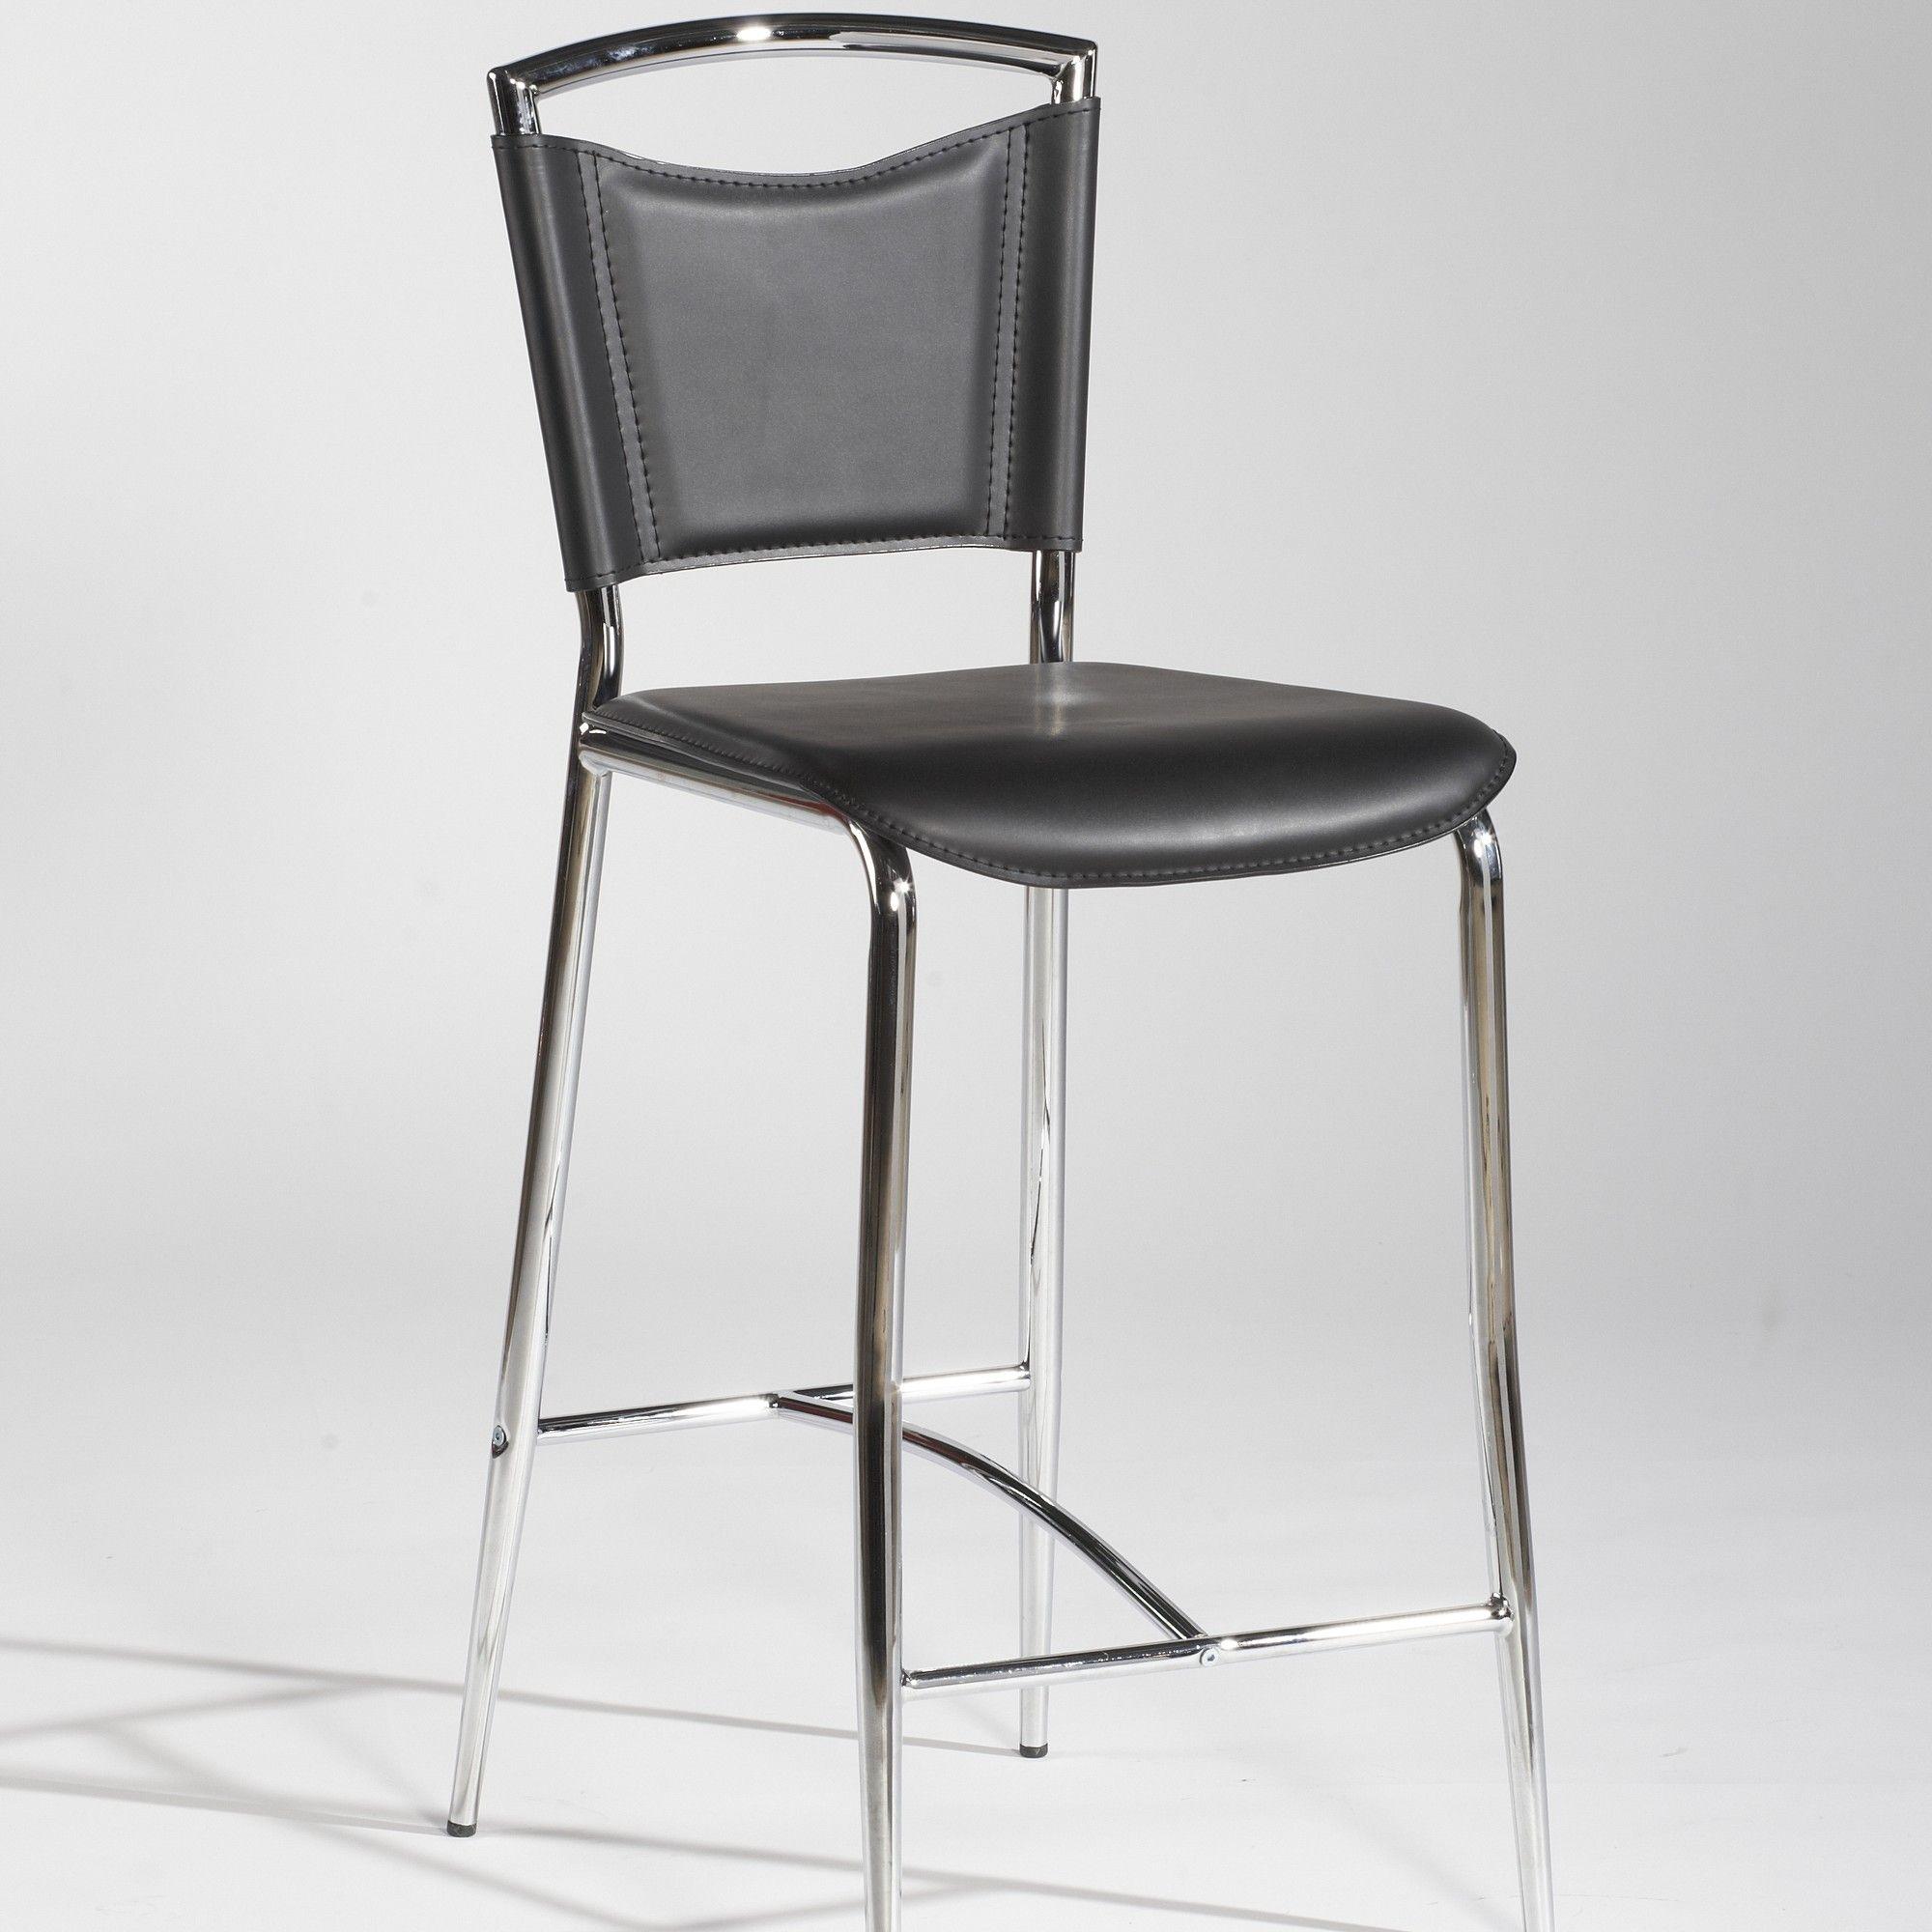 Astonishing Gwen 30 Bar Stool Set Of 4 Counter Height Stools Bar Lamtechconsult Wood Chair Design Ideas Lamtechconsultcom